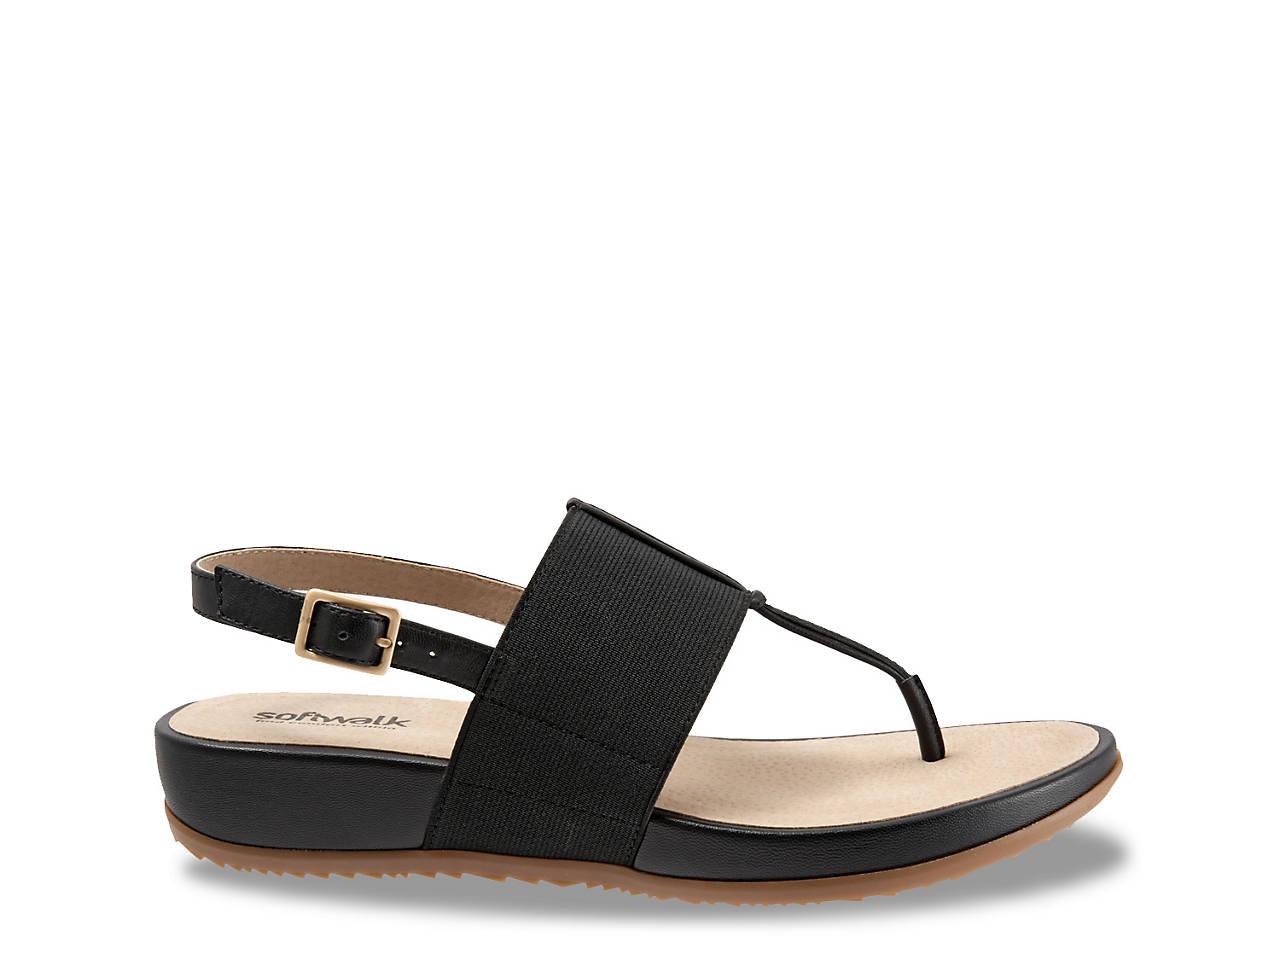 106b7c6401ad Softwalk Daytona Wedge Sandal Women s Shoes